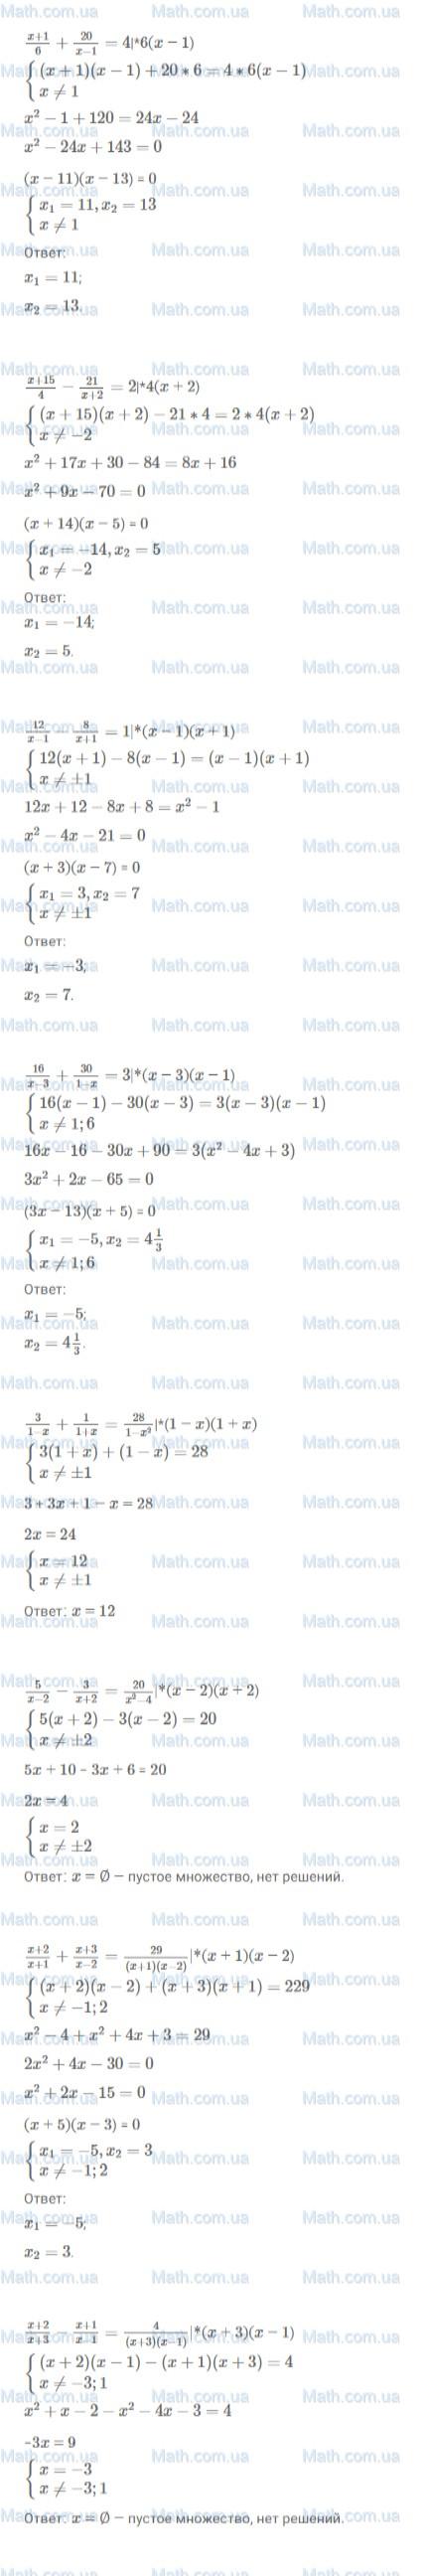 Гдз 976 номер алгебра 8 класс ю. Н. Макарычев, н. Г. Миндюк.